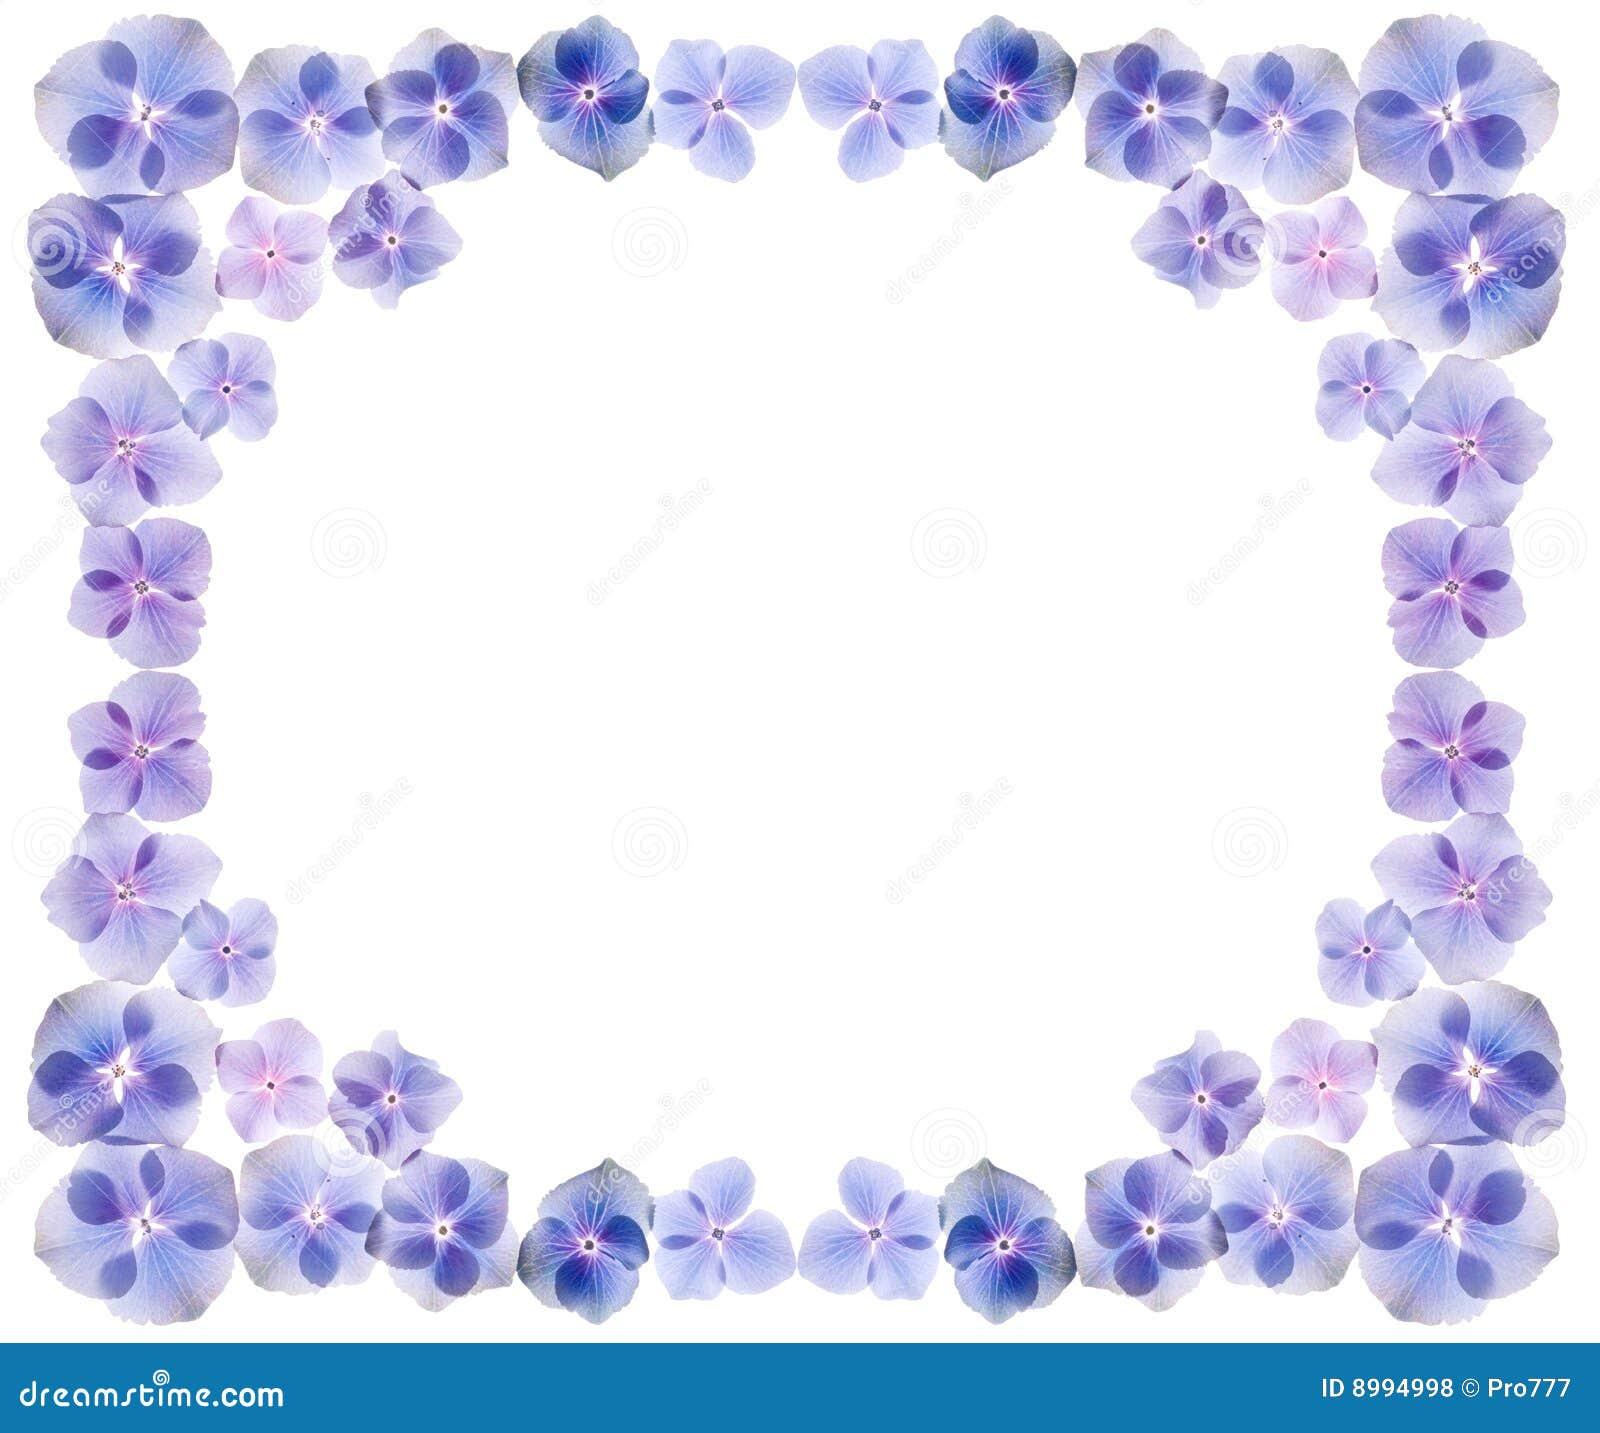 Hydrangea Flowers Frame Royalty Free Stock Photos - Image: 8994998